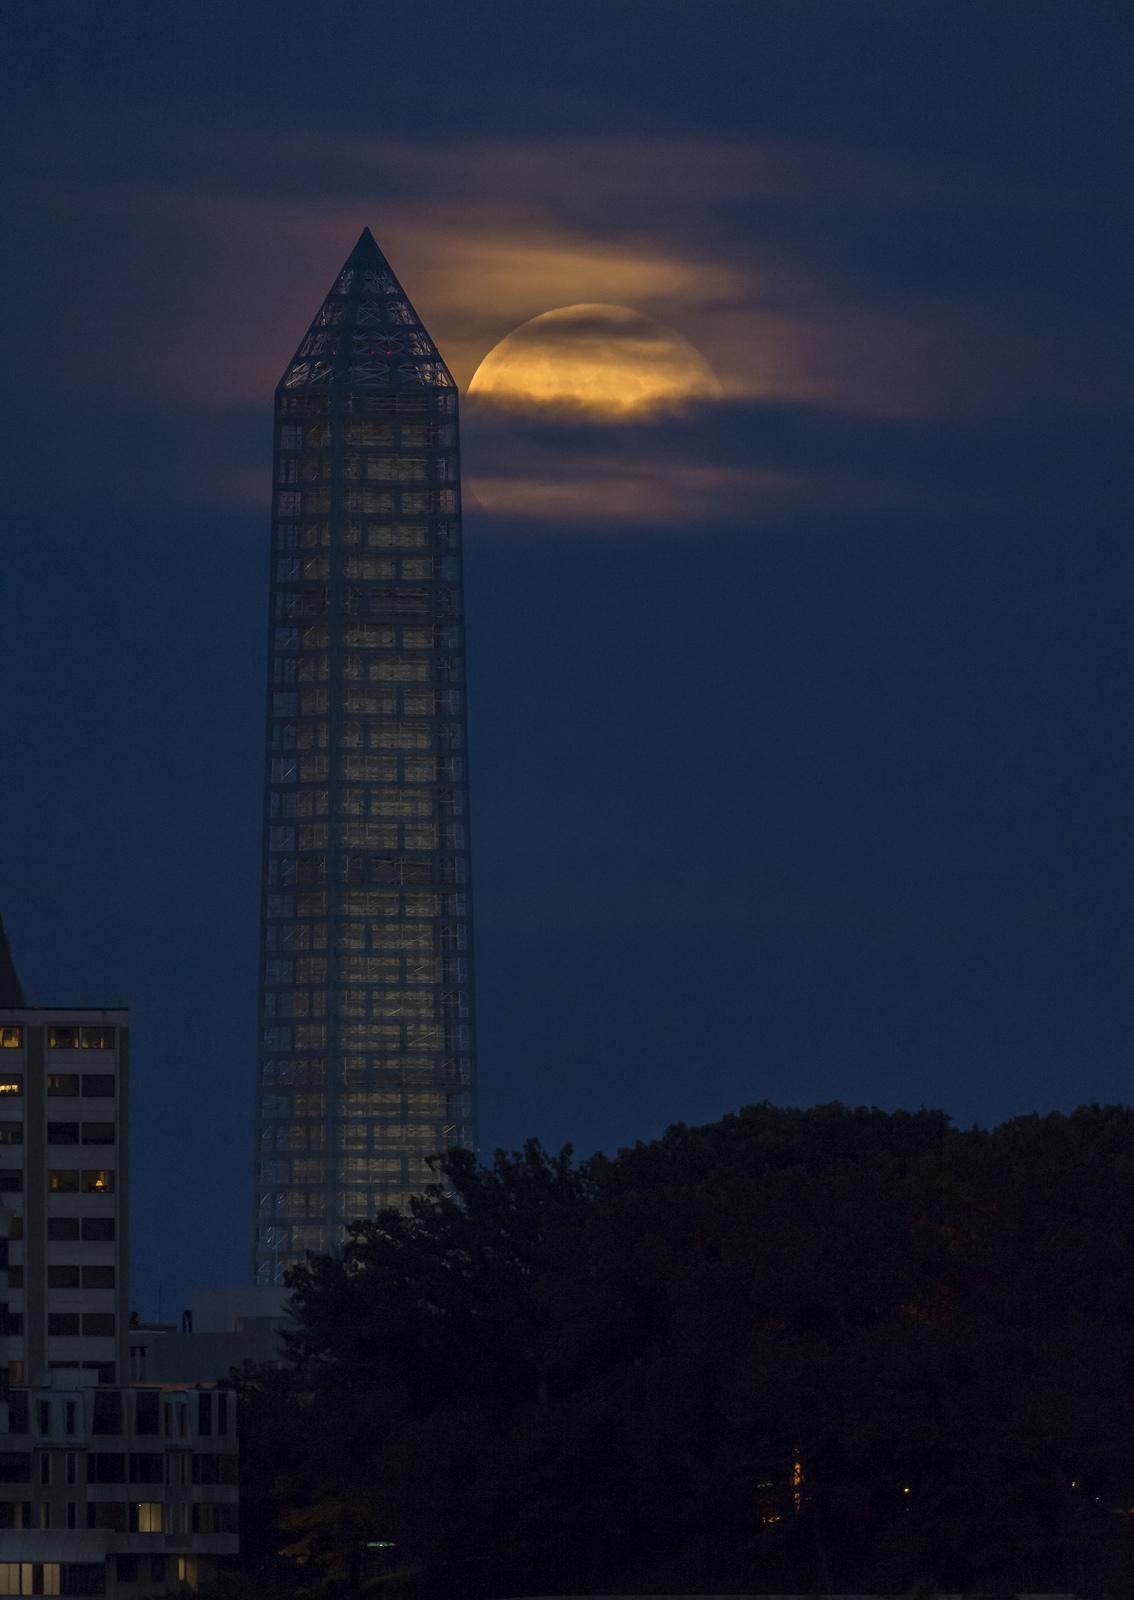 Supermoon Climbs Up Washington Monument